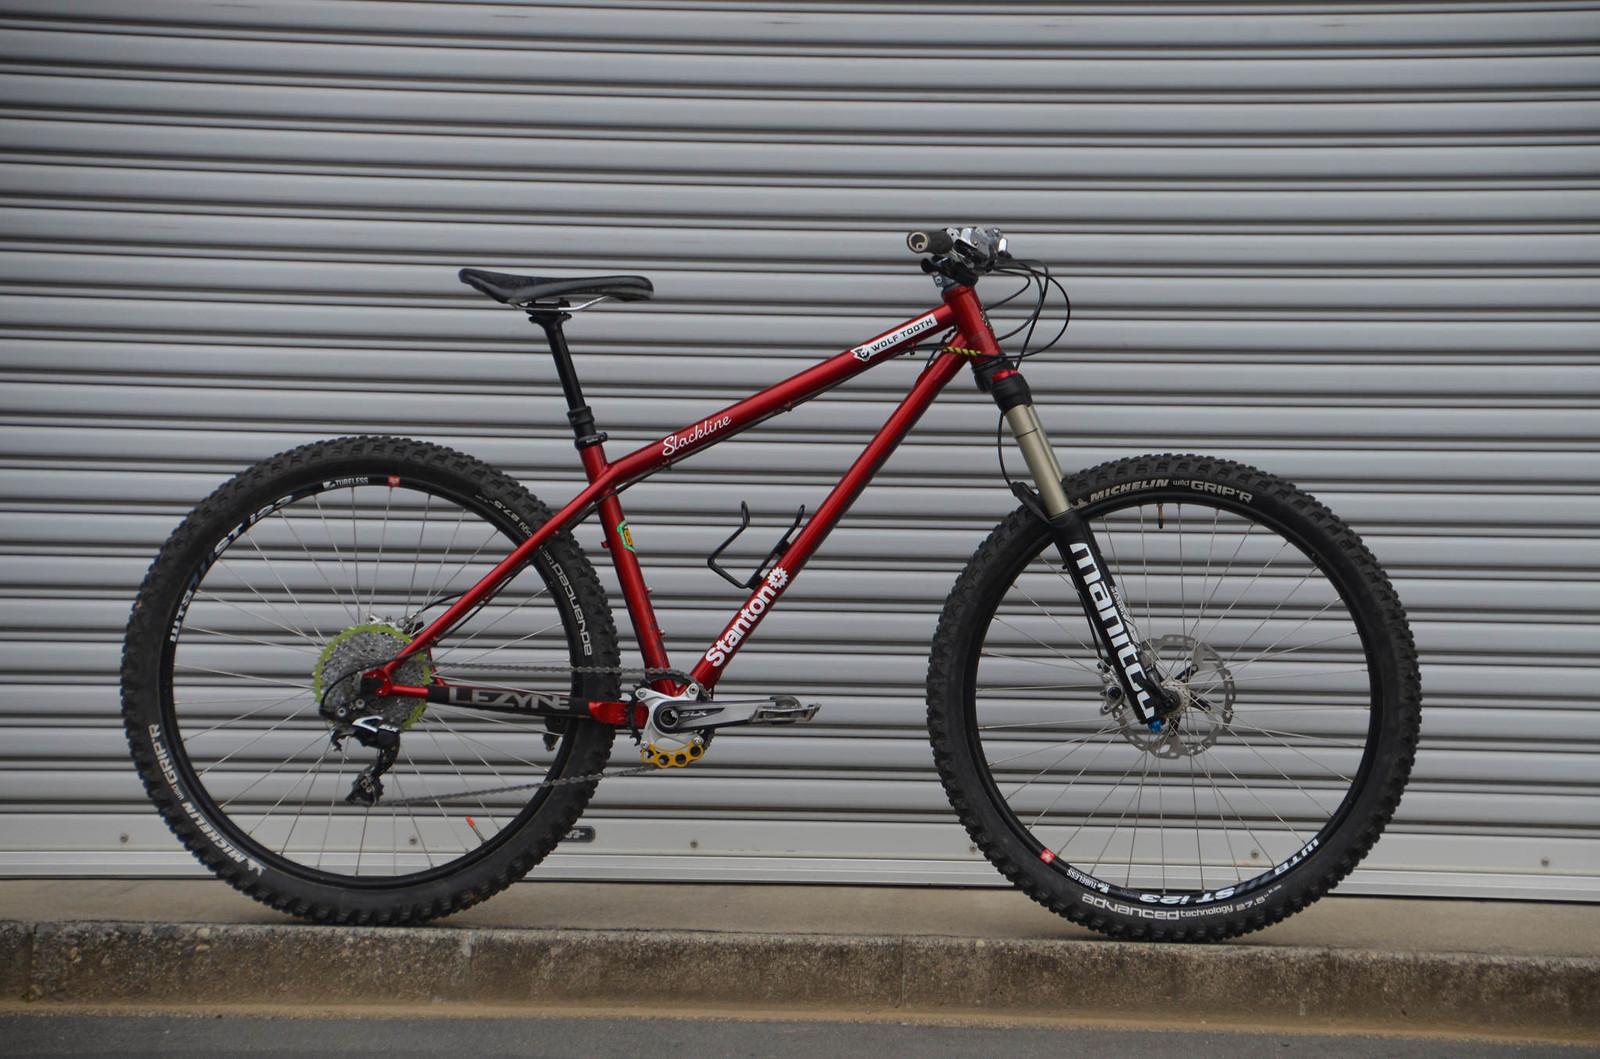 STANTONBIKES SLACKLINE - eng_kbz\'s Bike Check - Vital MTB